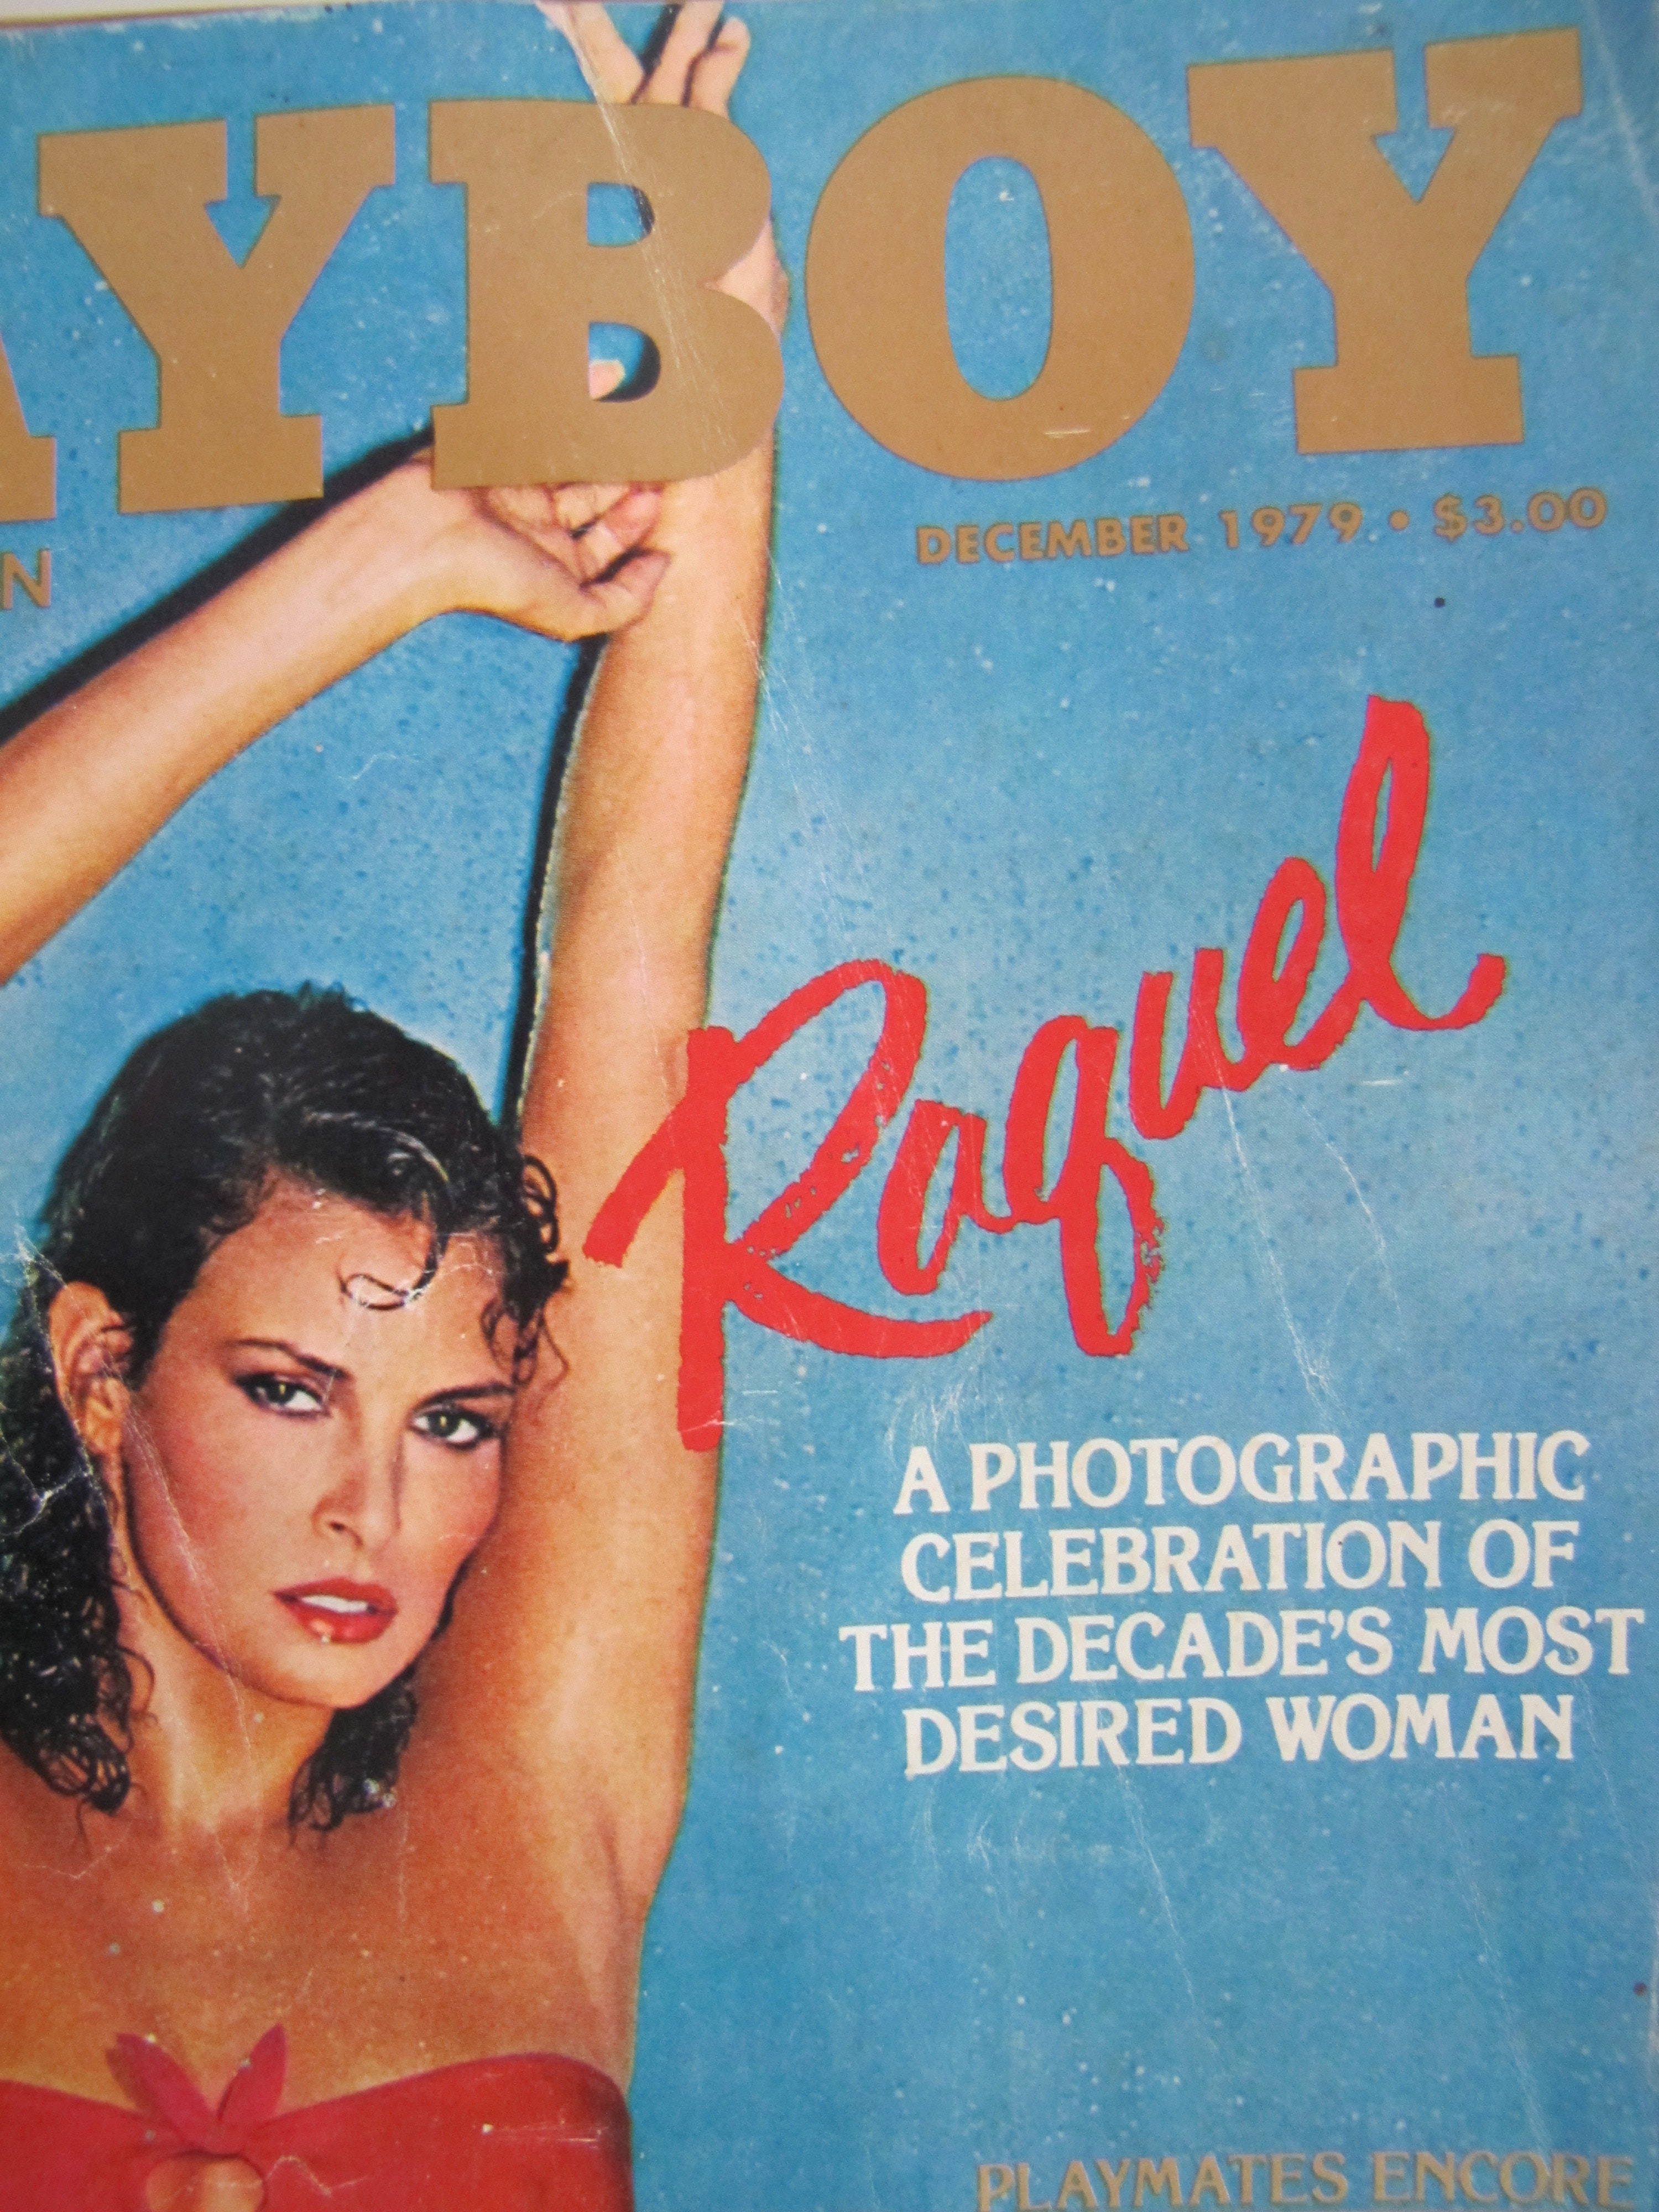 VINTAGE PLAYBOY MAGAZINES 1982 11 ISSUES USED